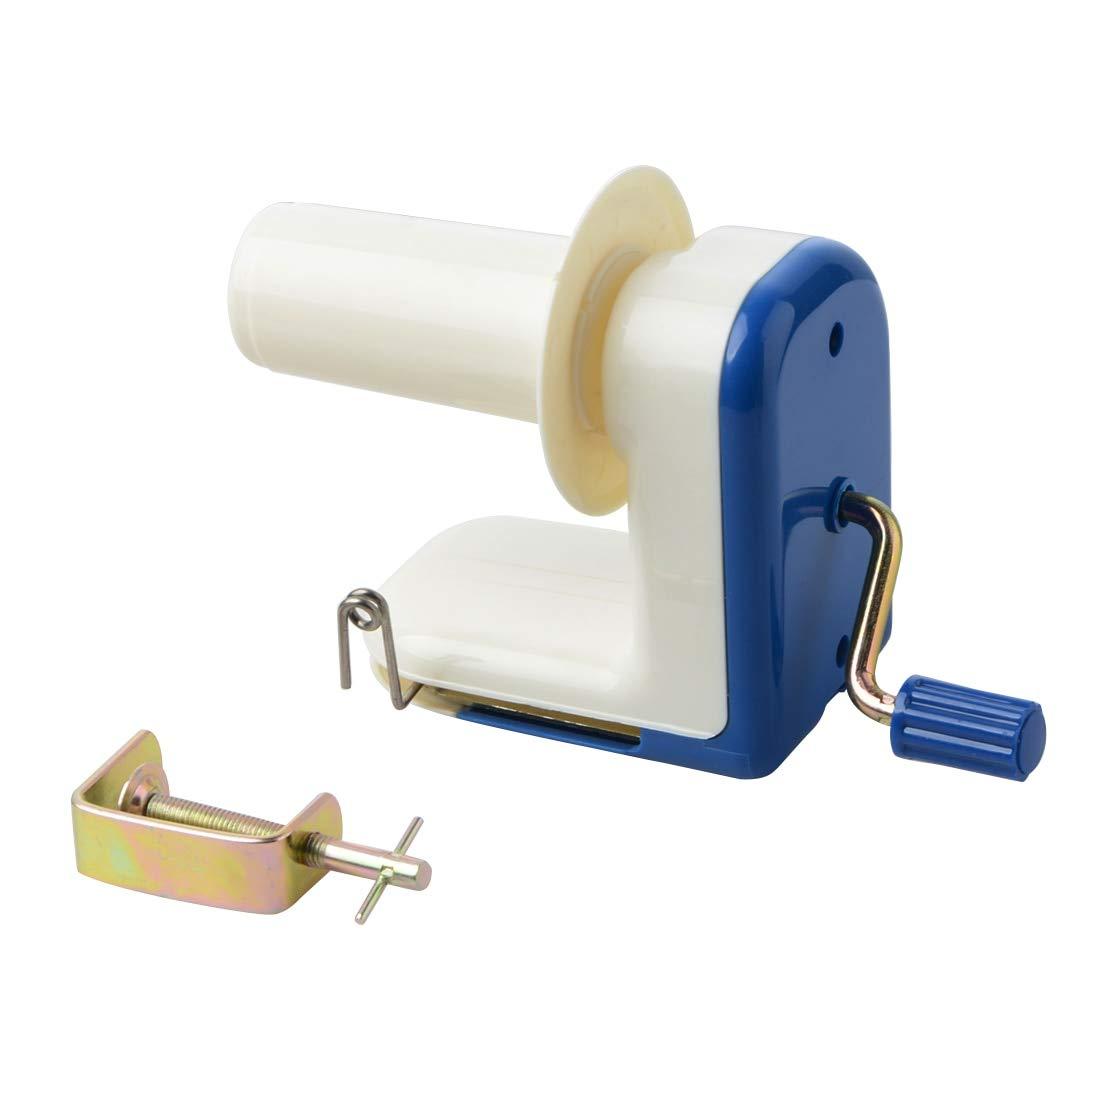 Sewing Tools Accessory - Portable Swift Yarn Fiber Winder Hand Operated Wool Holder String Ball Thread Skein Household Blue - Yarn Yarn Big Loom Wheel Winder Cotton Machine YarnSewing